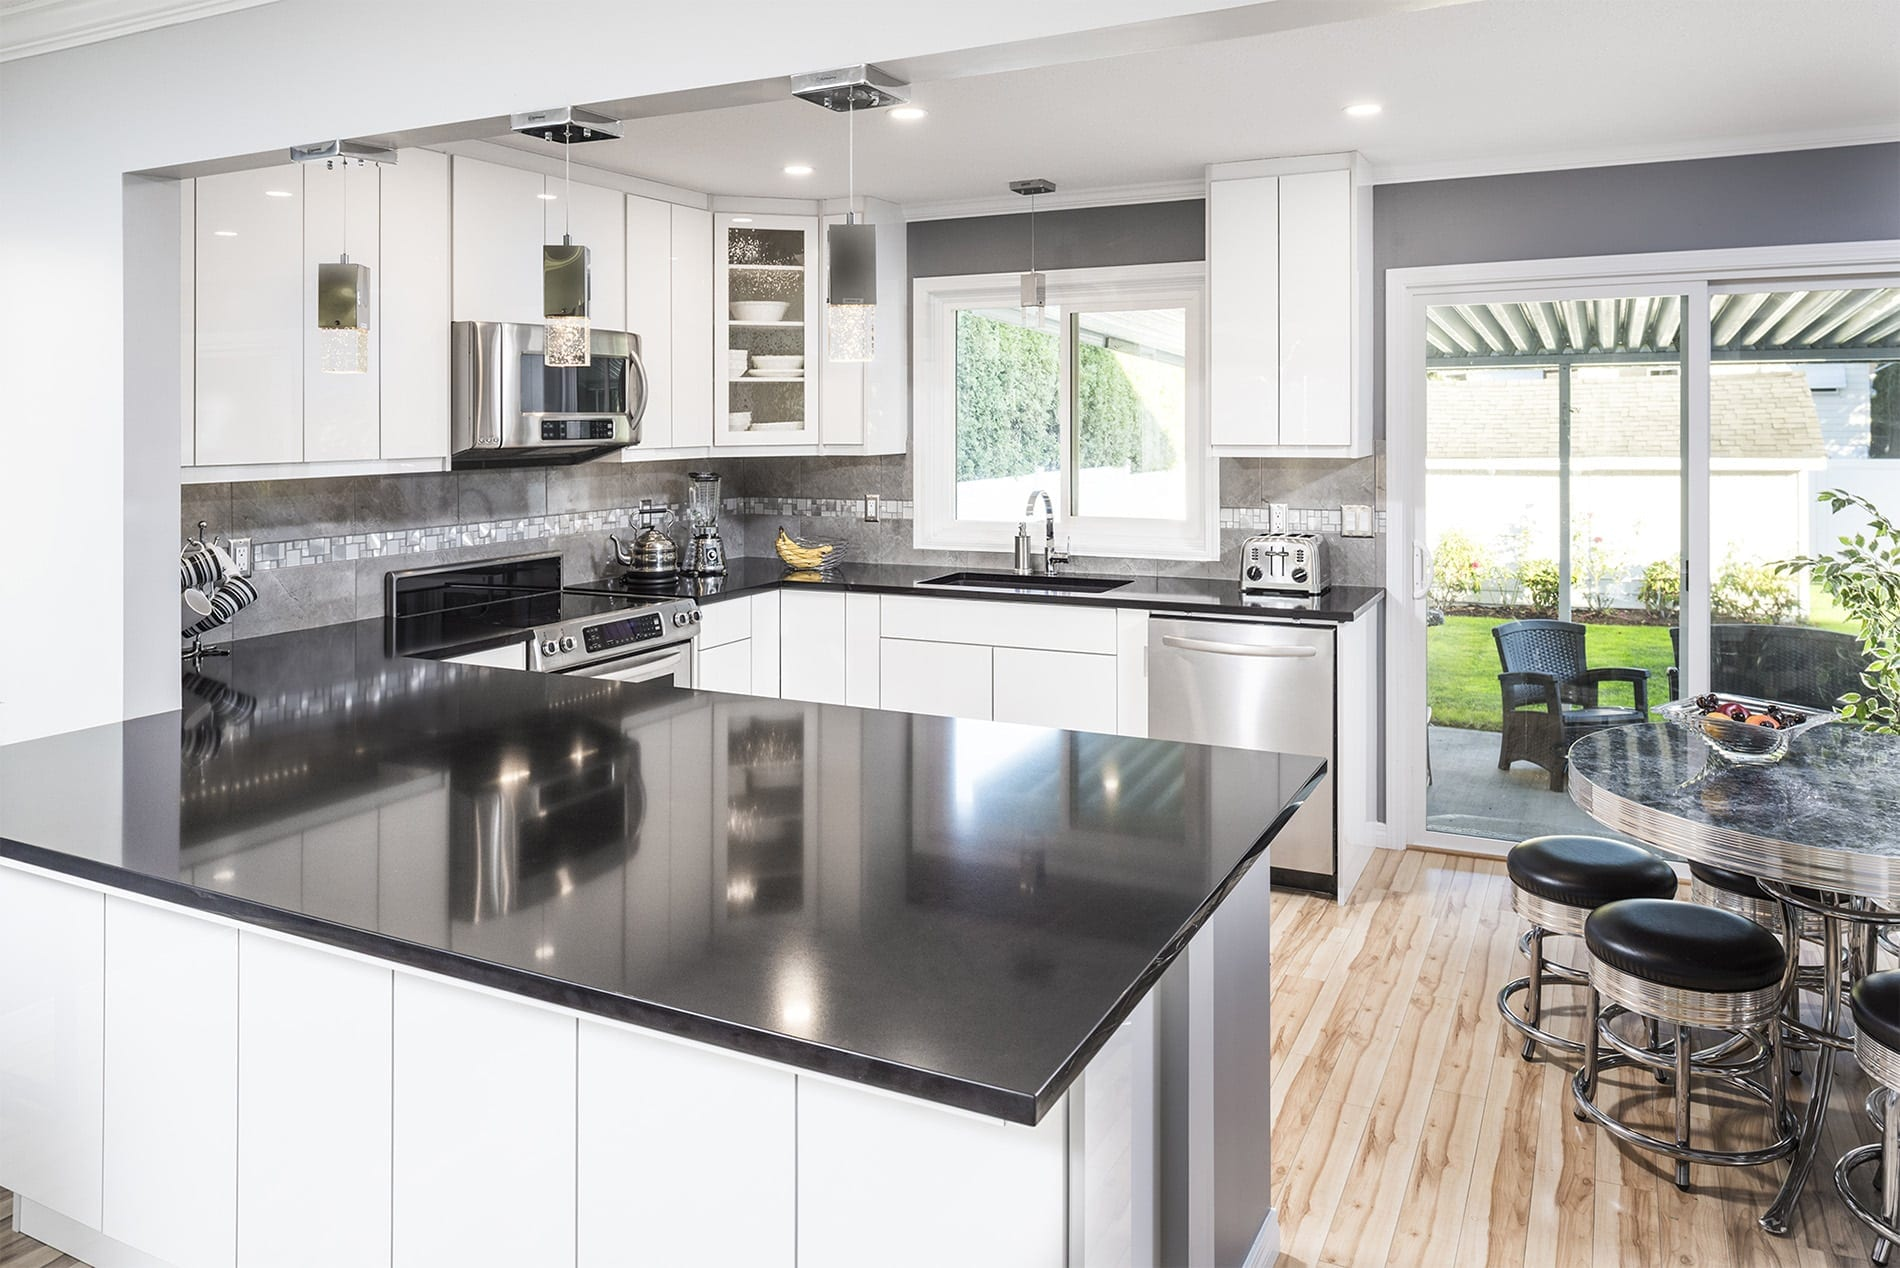 Kitchen Renovations Master Painting countertops